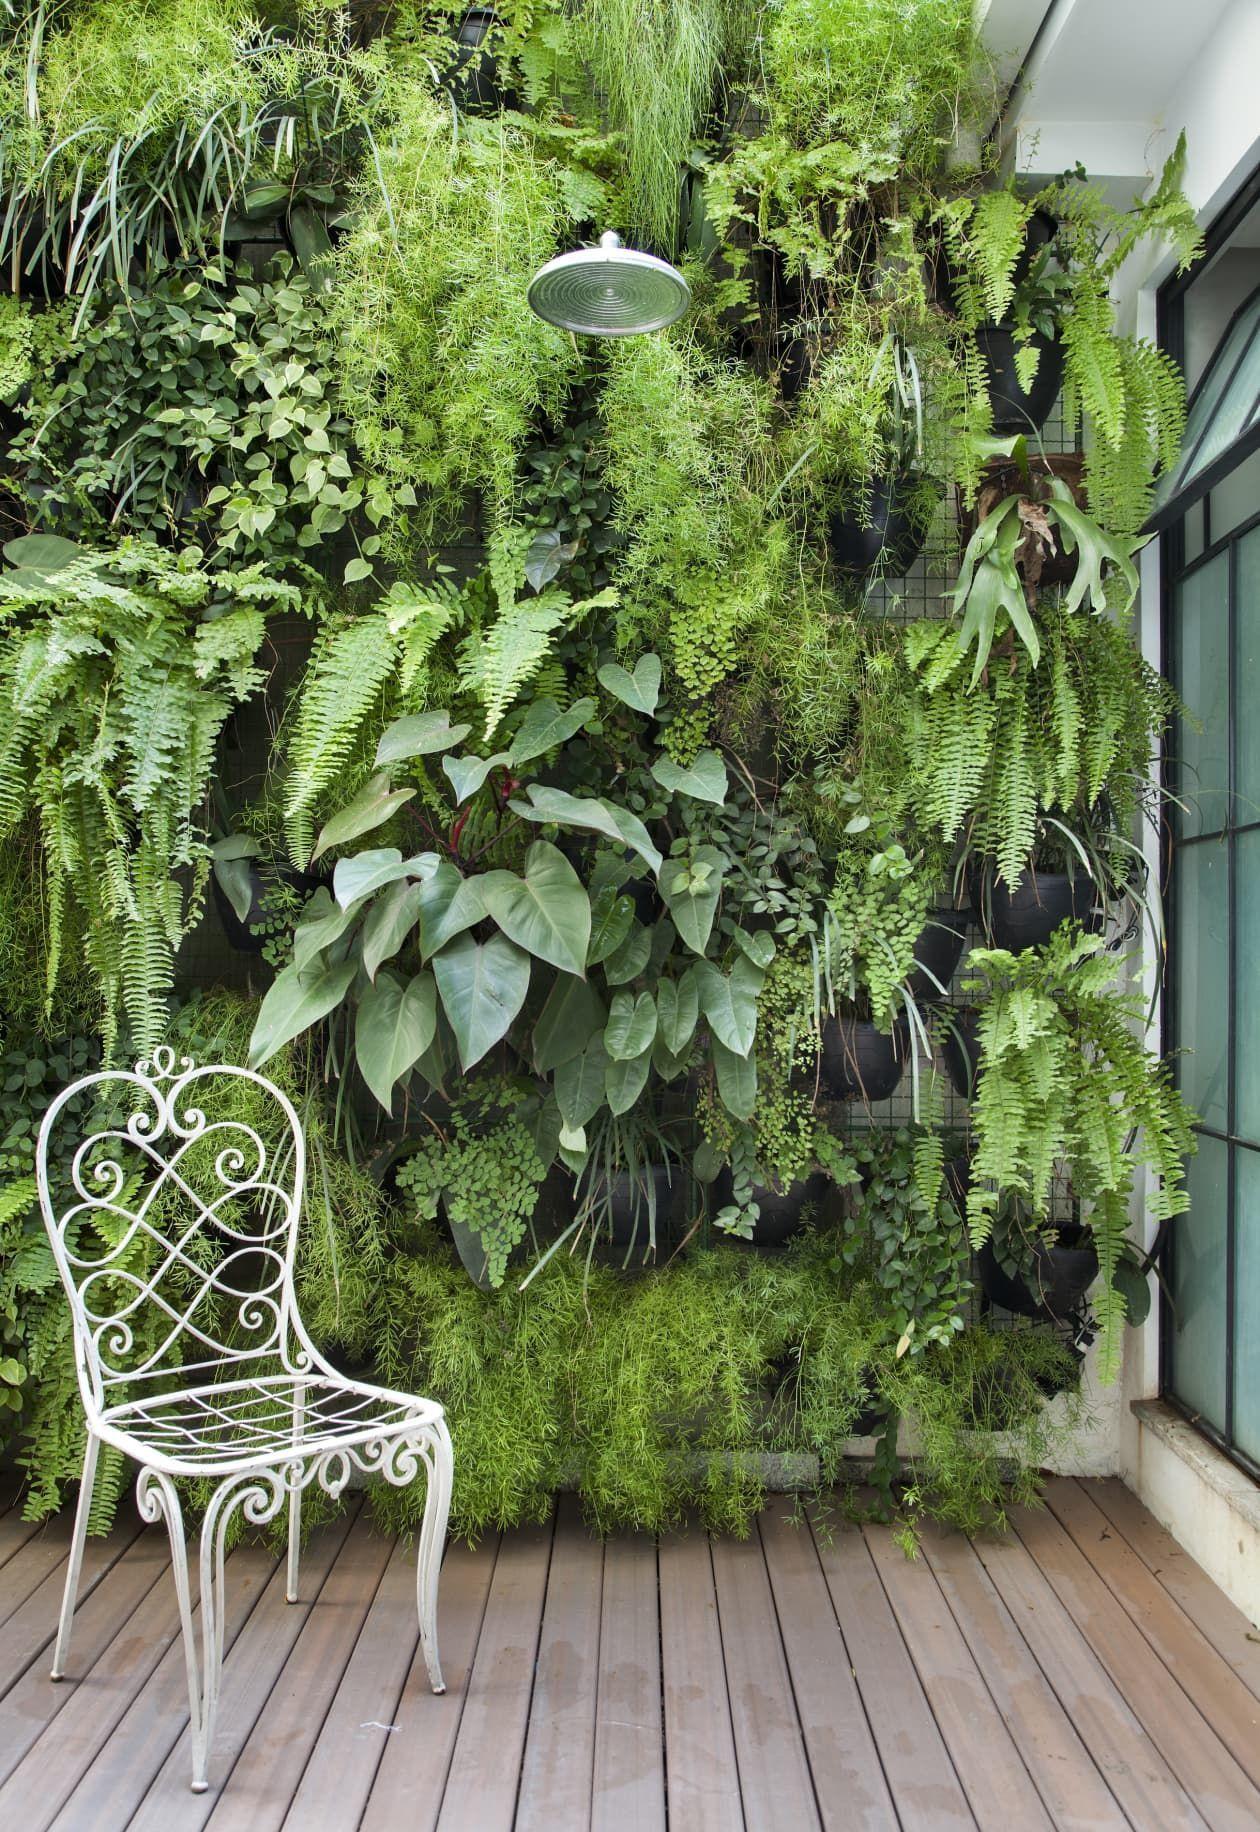 Big Garden Garten Garden Garden Ideas Xeriscape Water Features Ornamental Grasses Apartm Vertical Garden Diy Vertical Garden Design Garden Wall Designs